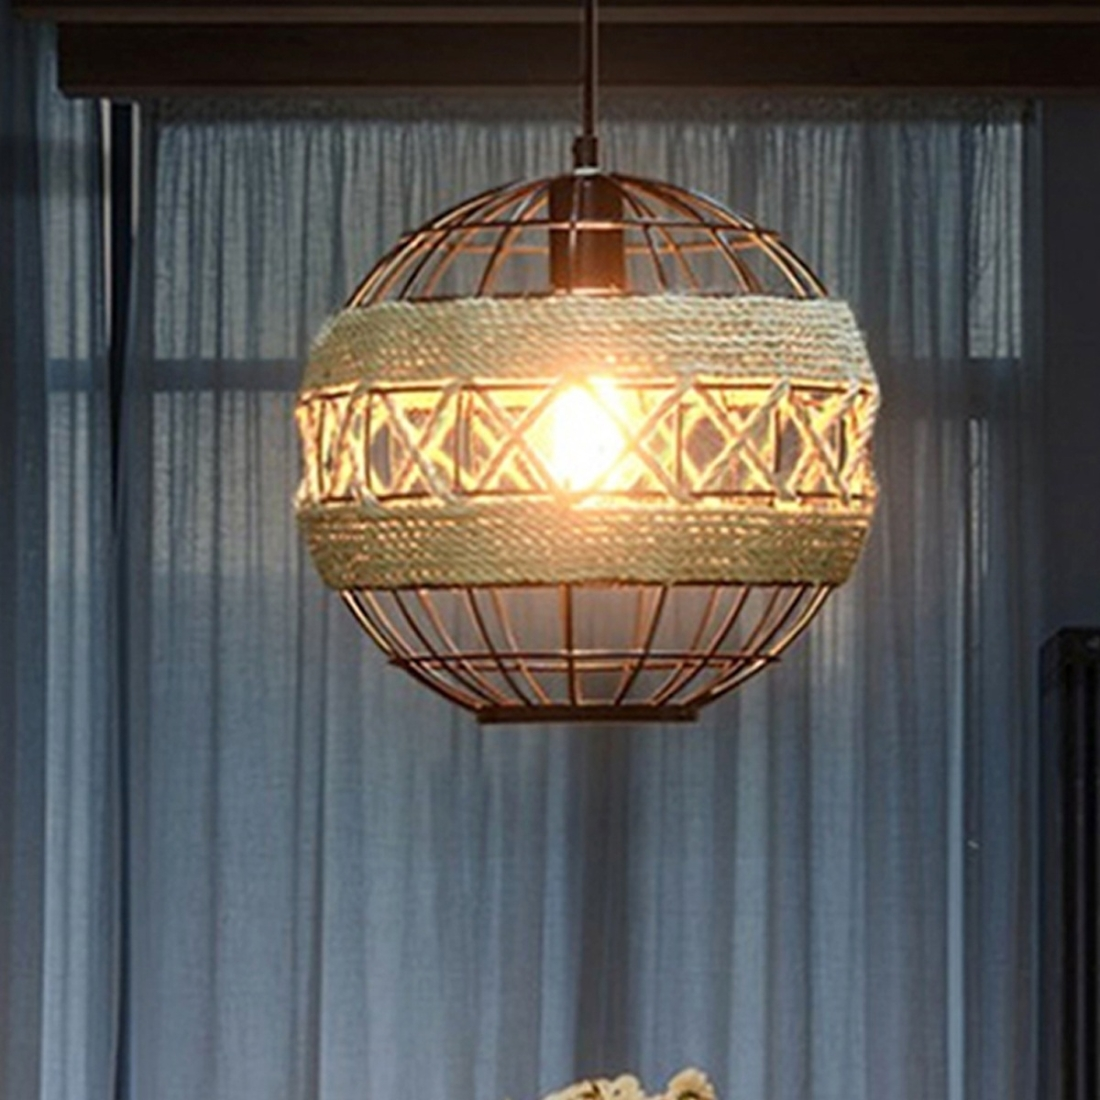 Ywxlight Vintage Style Pendant Lighting Loft Hemp Rope Art Deco Light Fixtures Restaurant Bar Lights Led Hanging Lamps Warm White